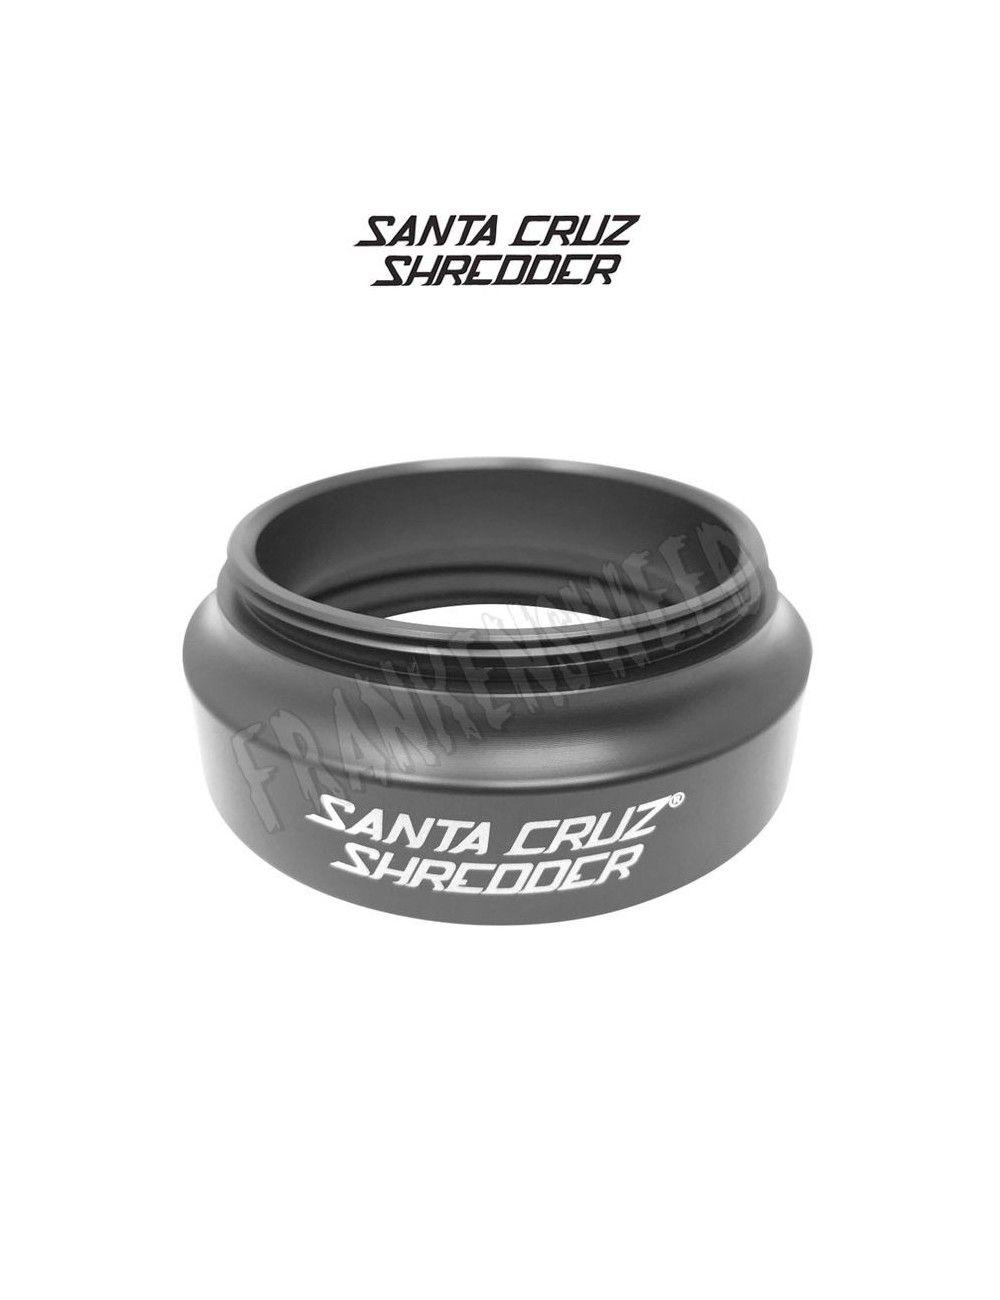 Santa Cruz Shredder Mason Jar Adapter - Black